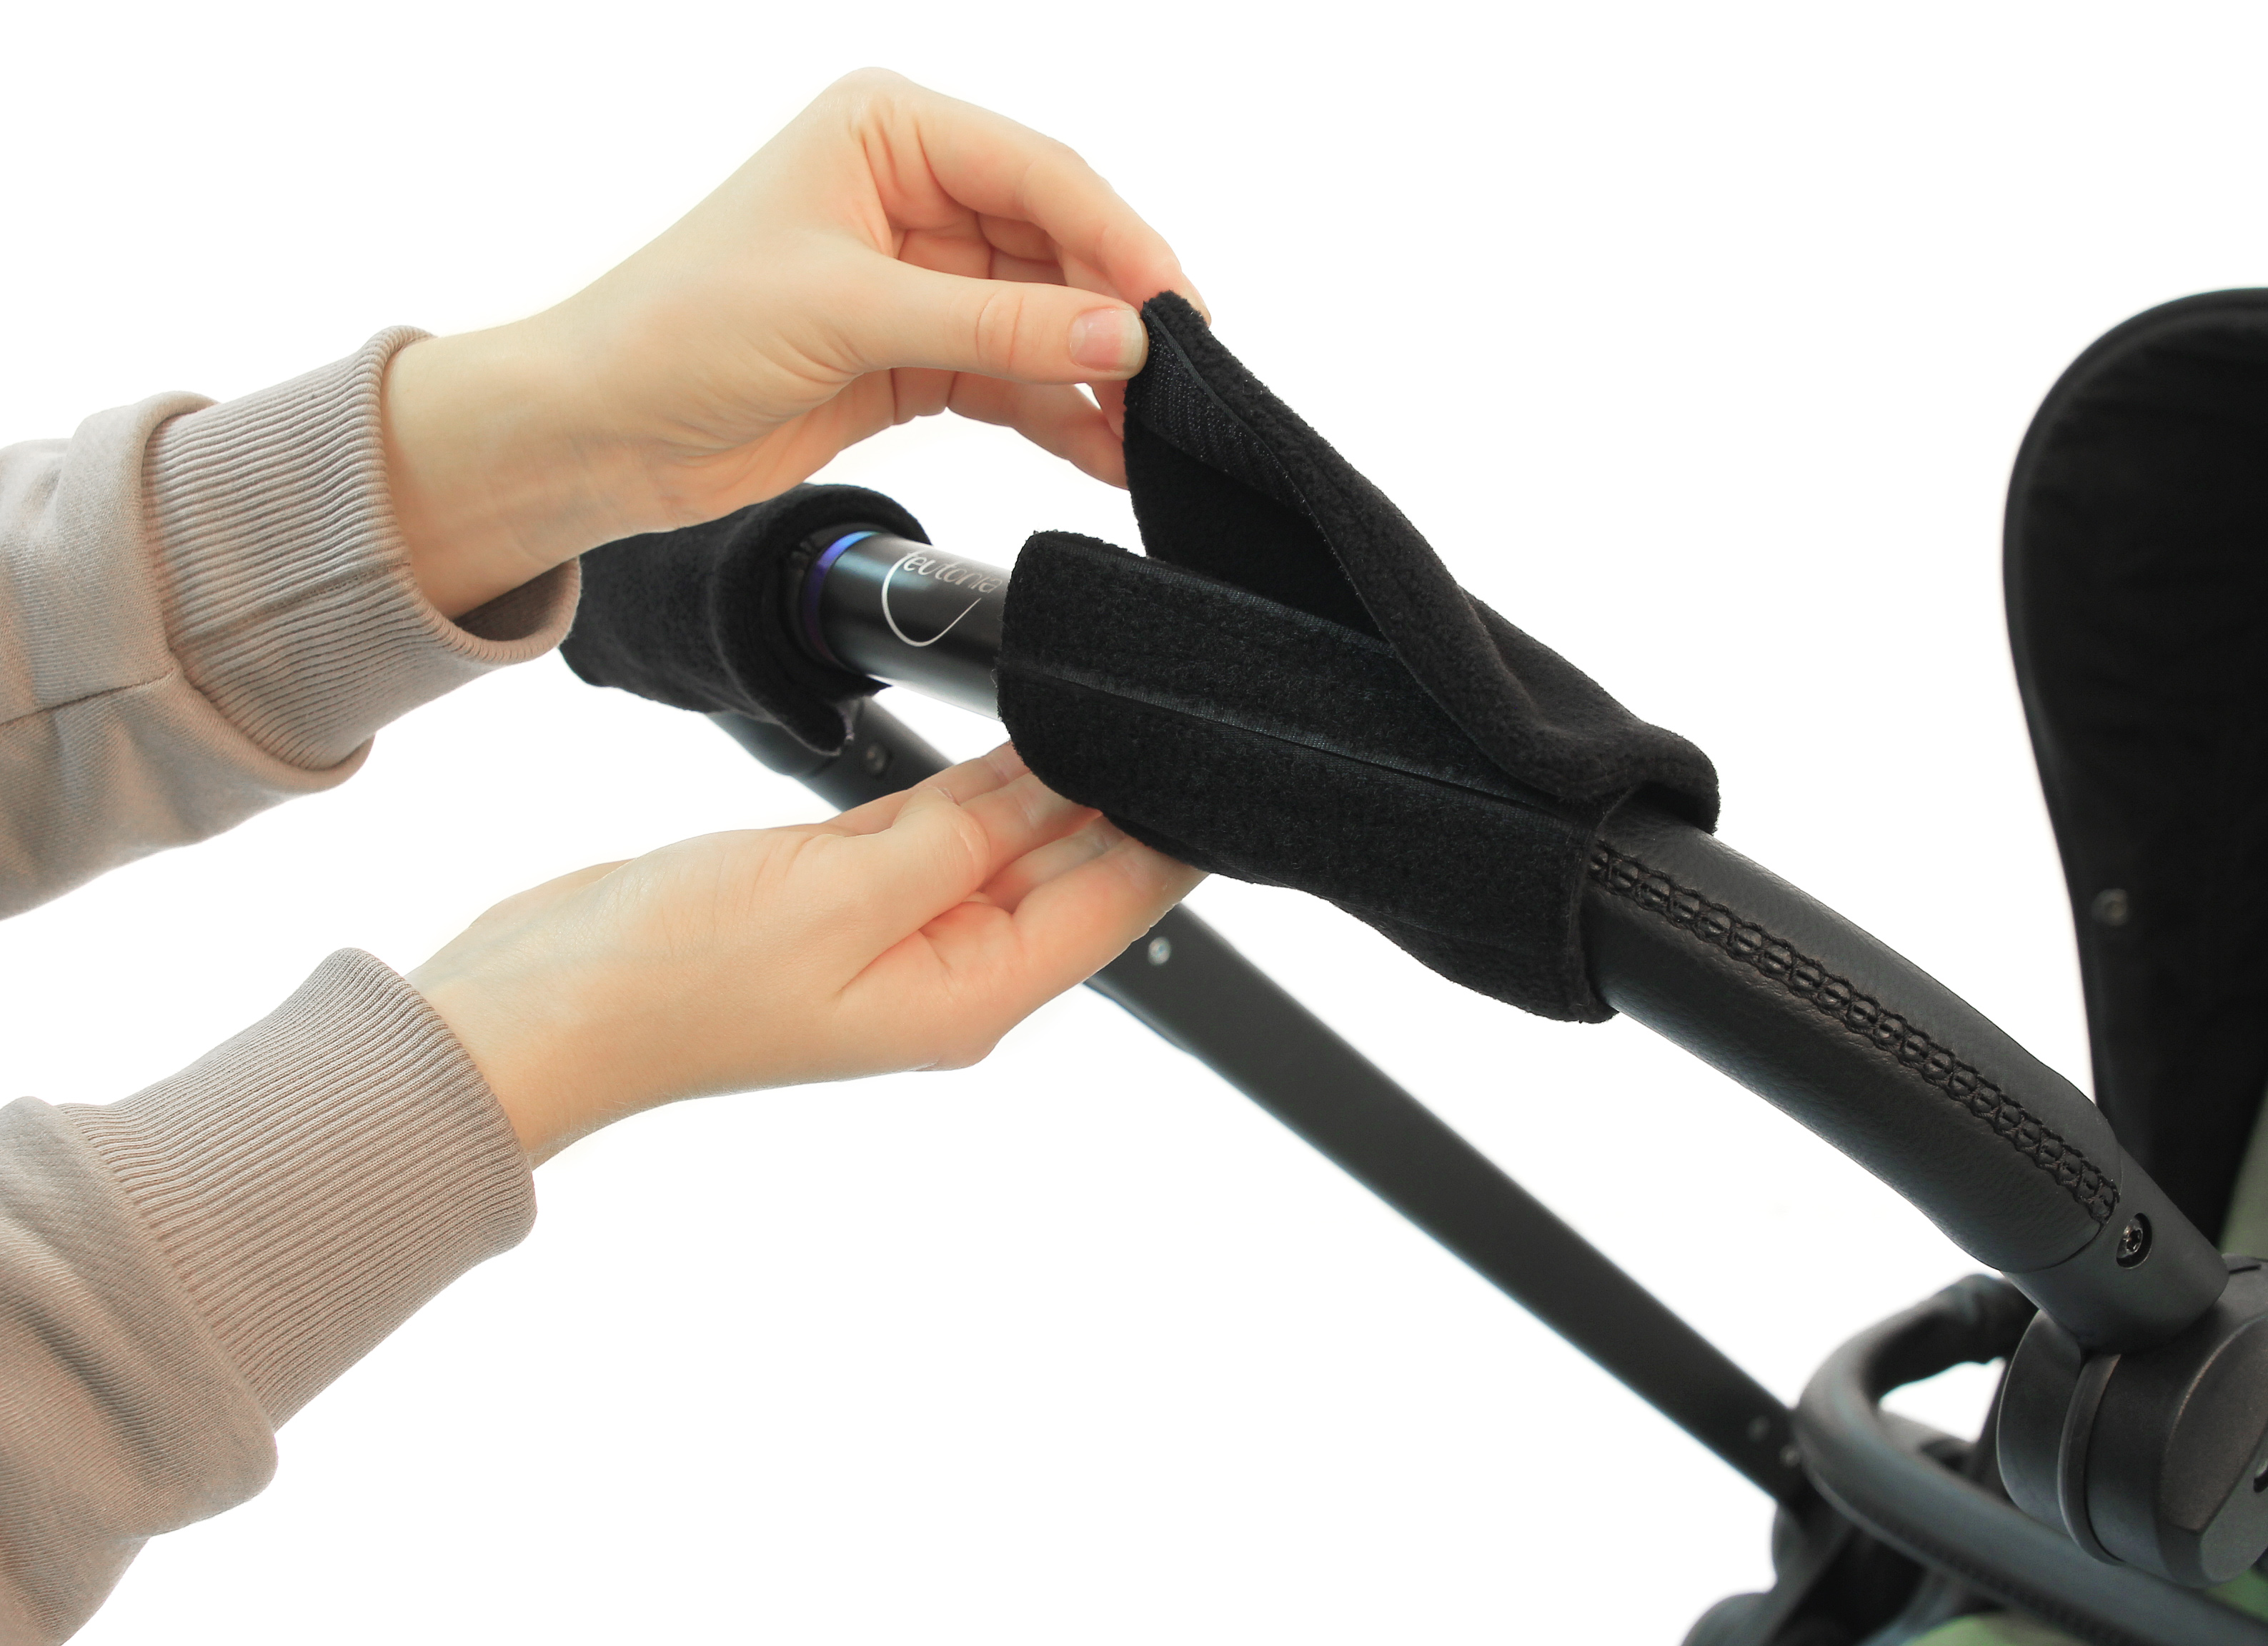 Накладки на ручки для коляски своими руками 47